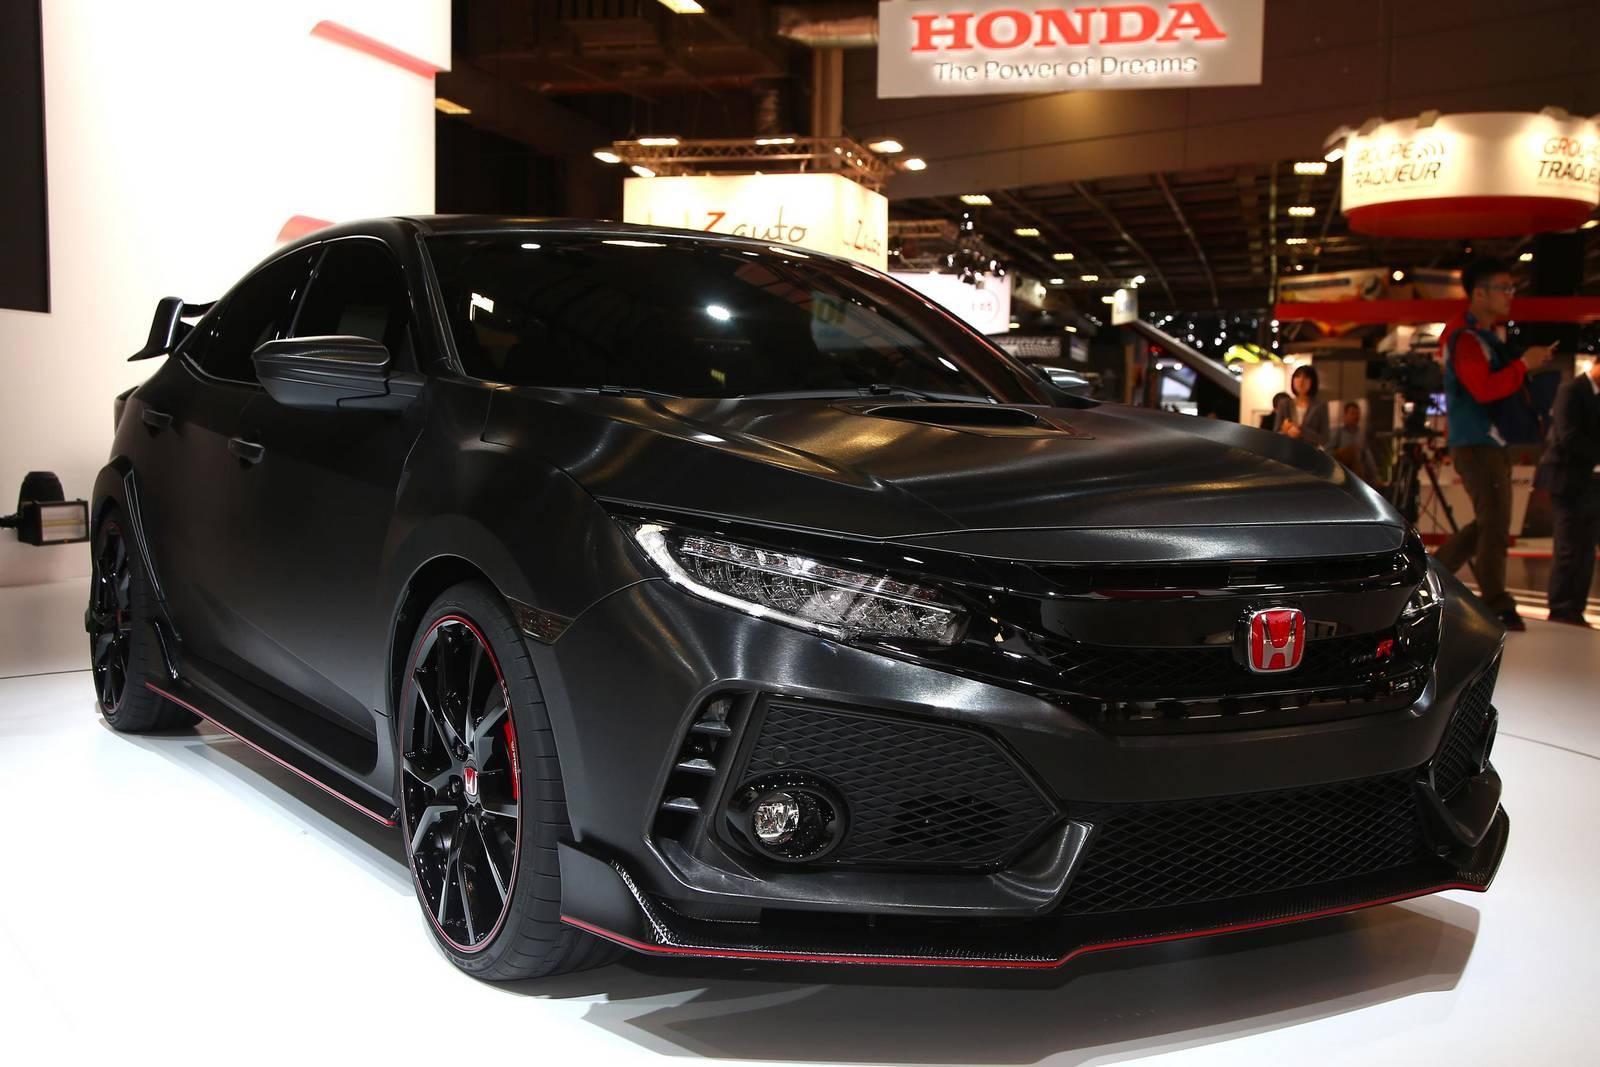 Хонда Цивик спереди